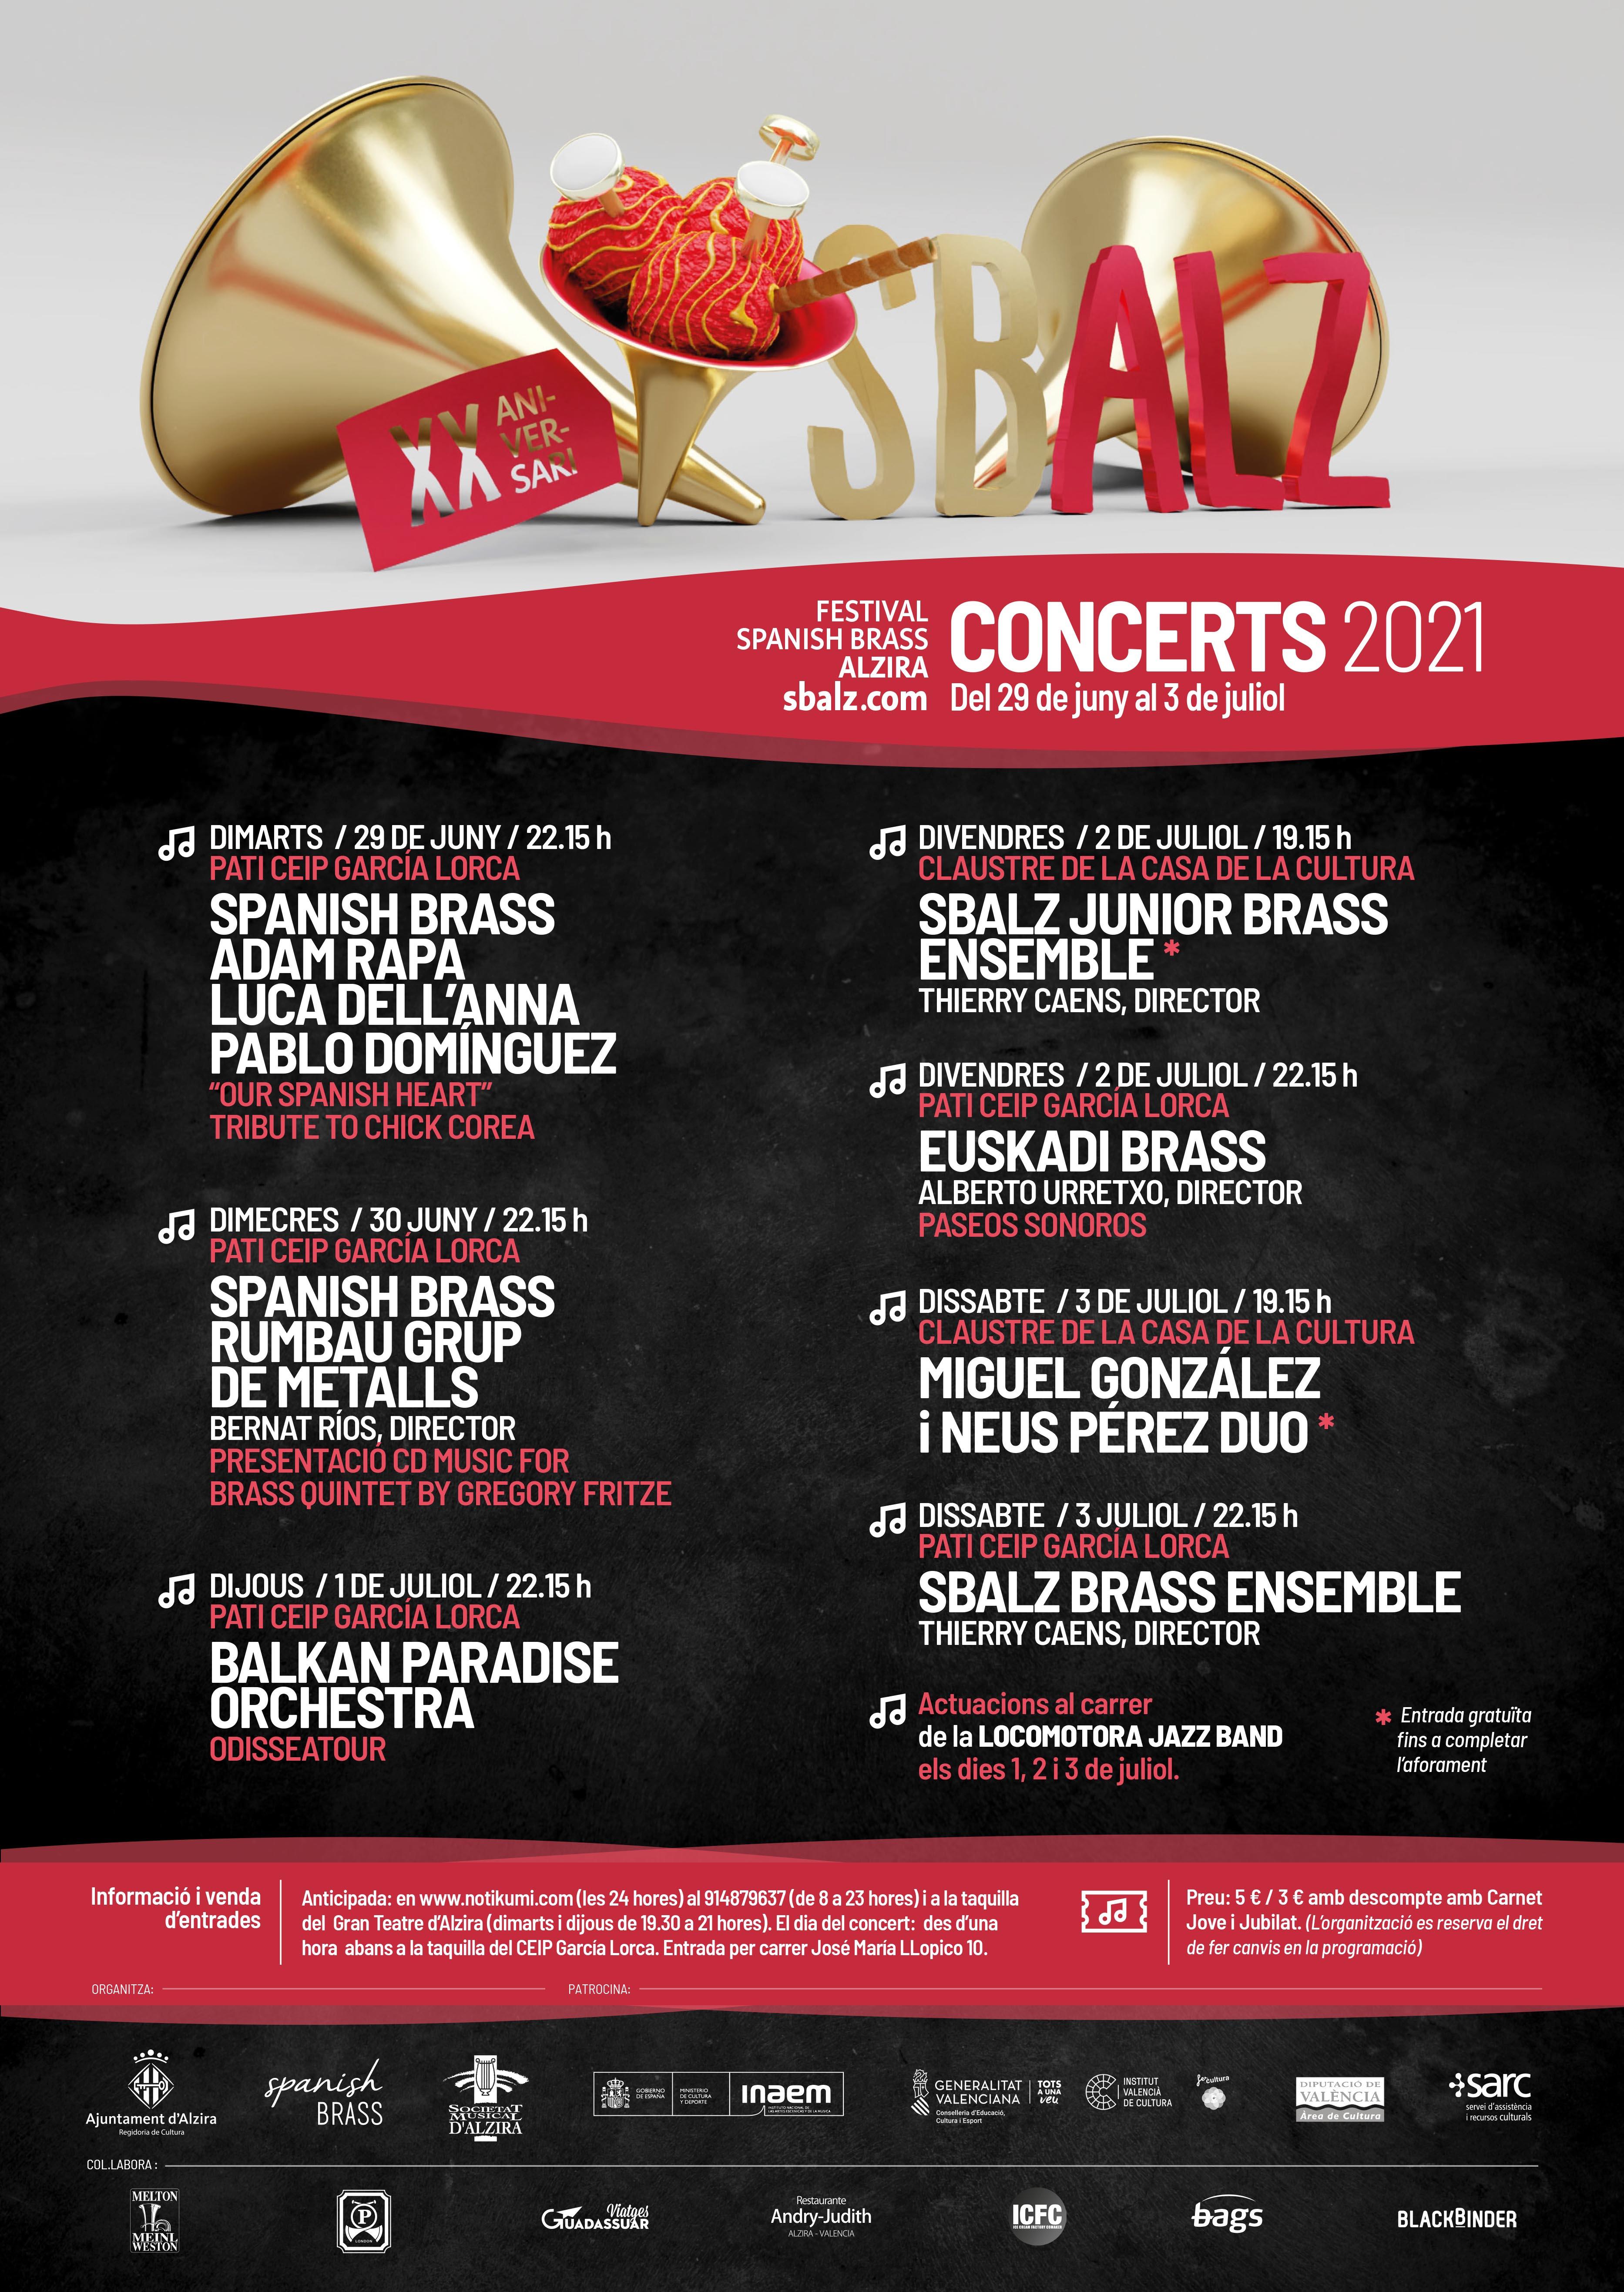 Festival Spanish Brass Alzira 2021